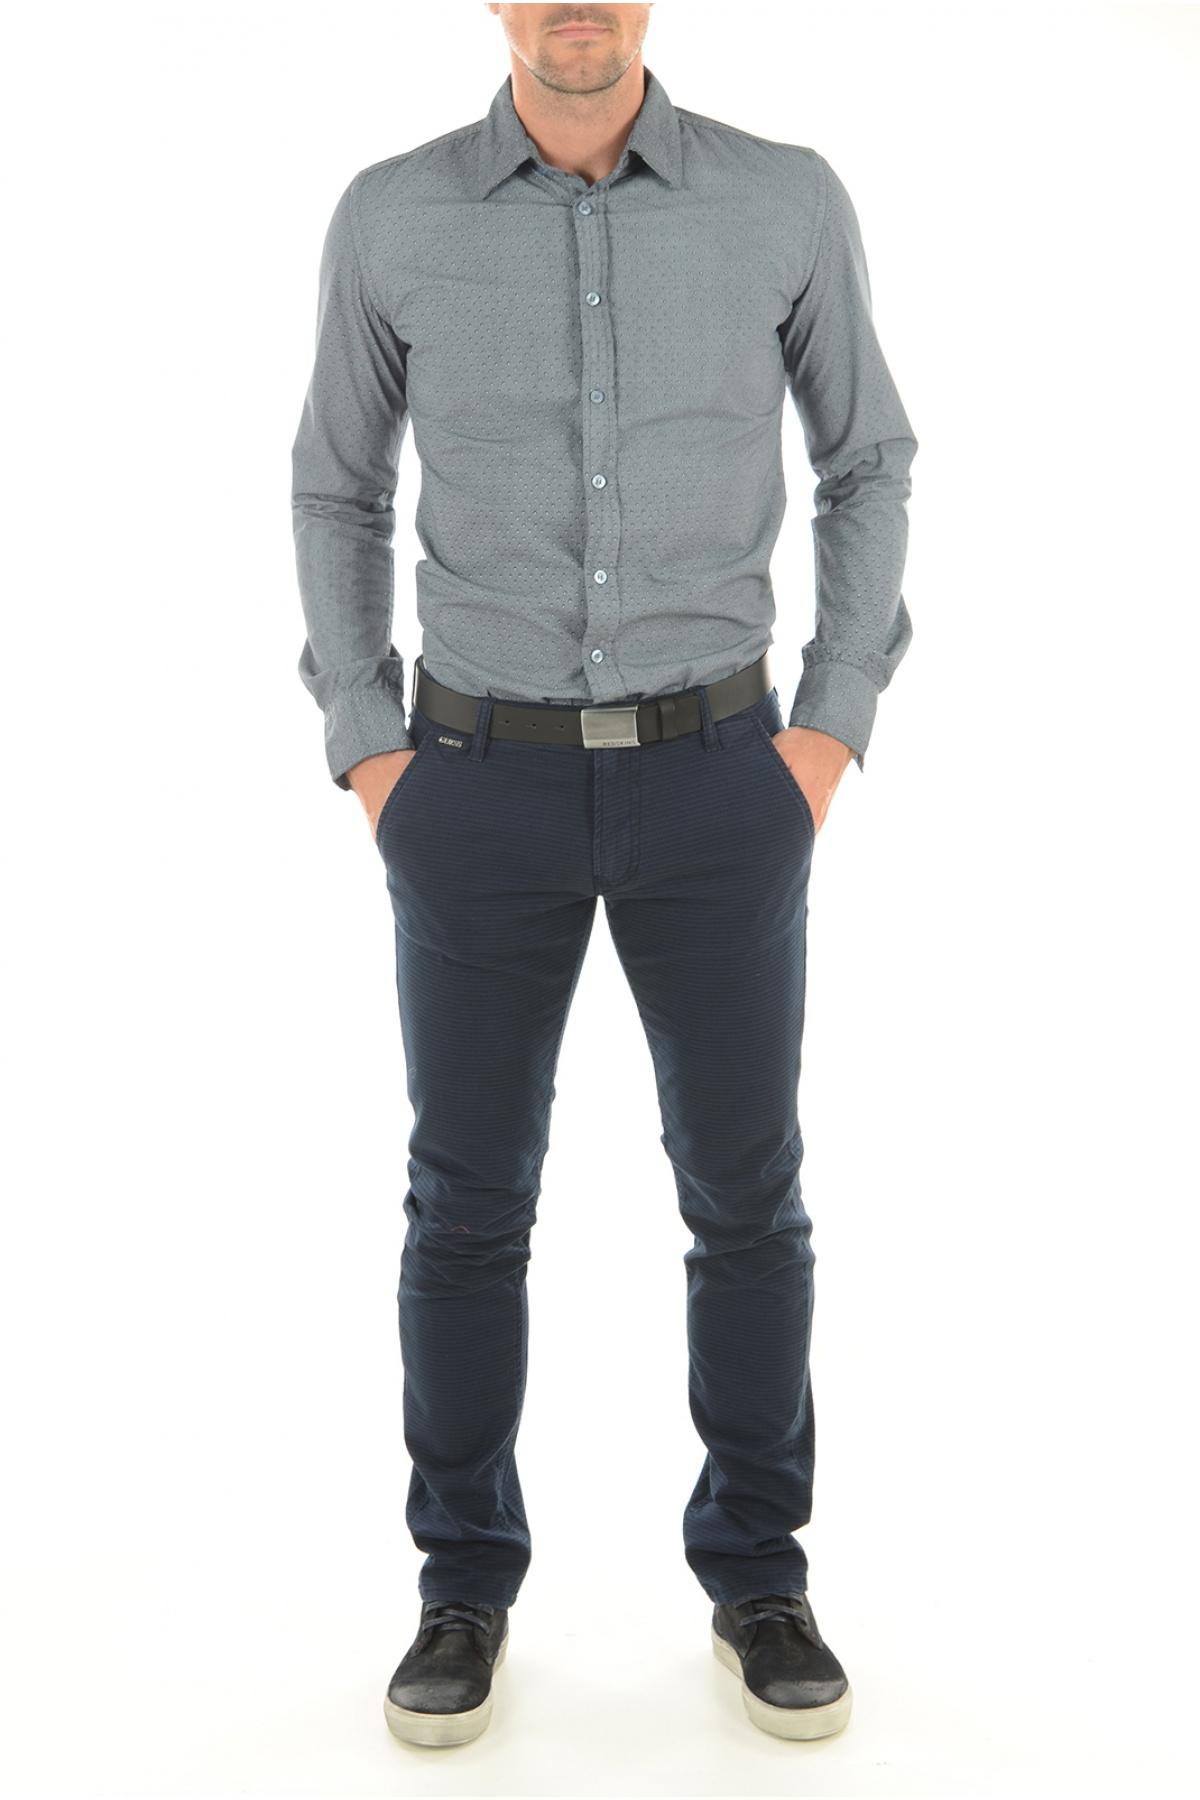 Chemise Printée Cordela - Biaggio Jeans